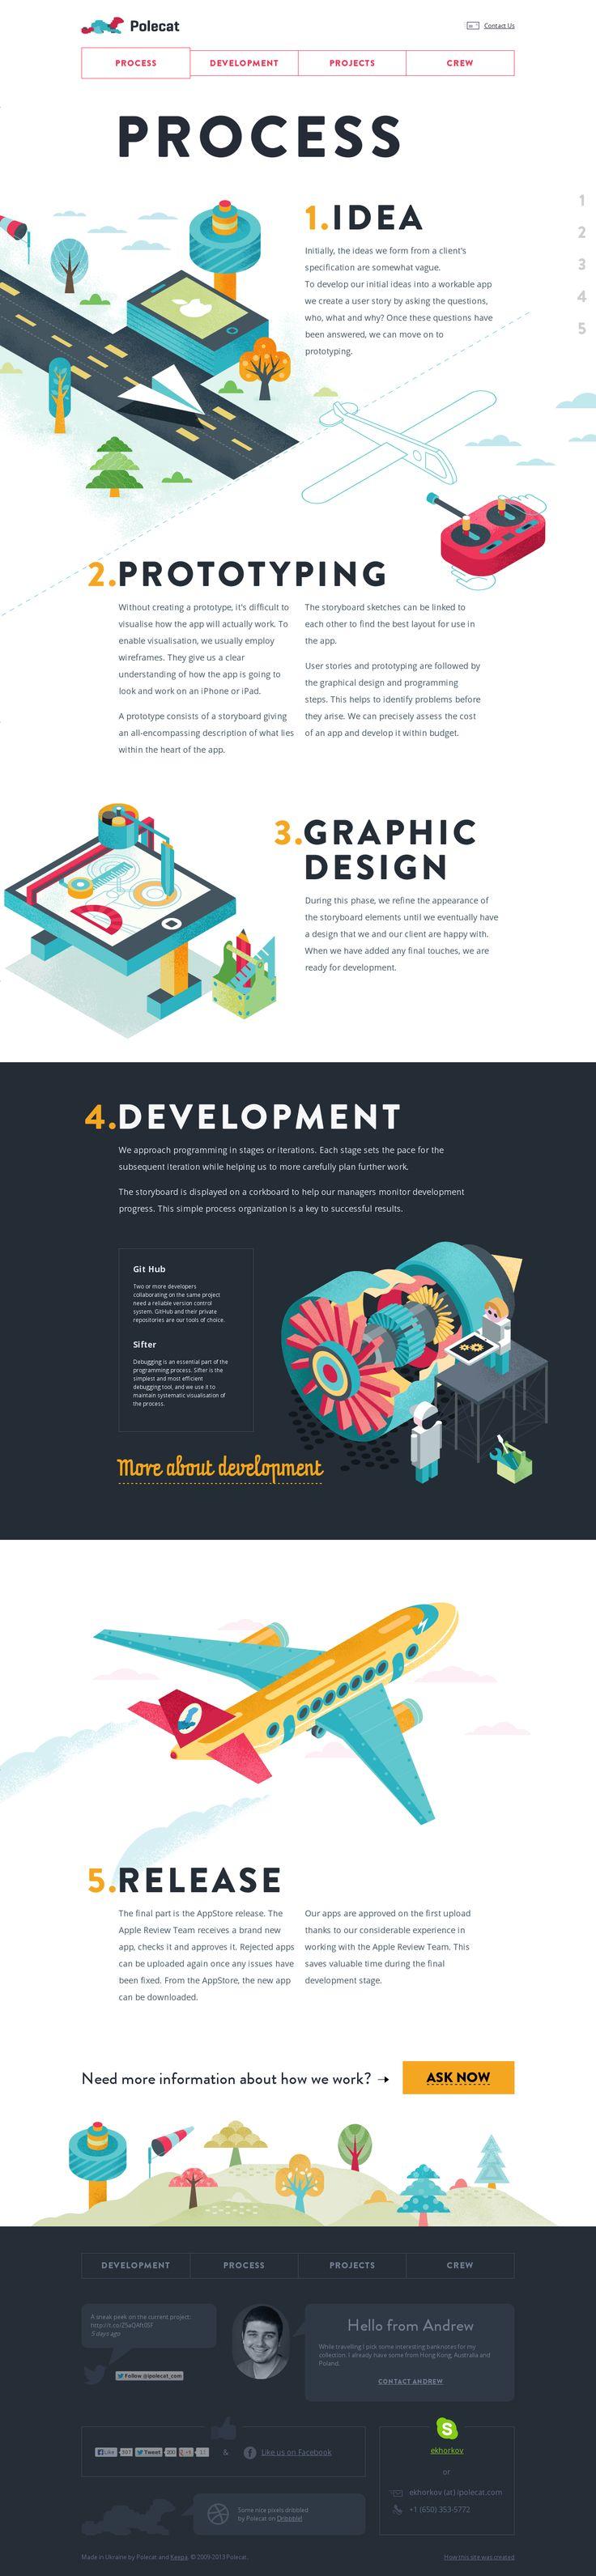 """We make iPhone & iPad apps"" #flatdesign"